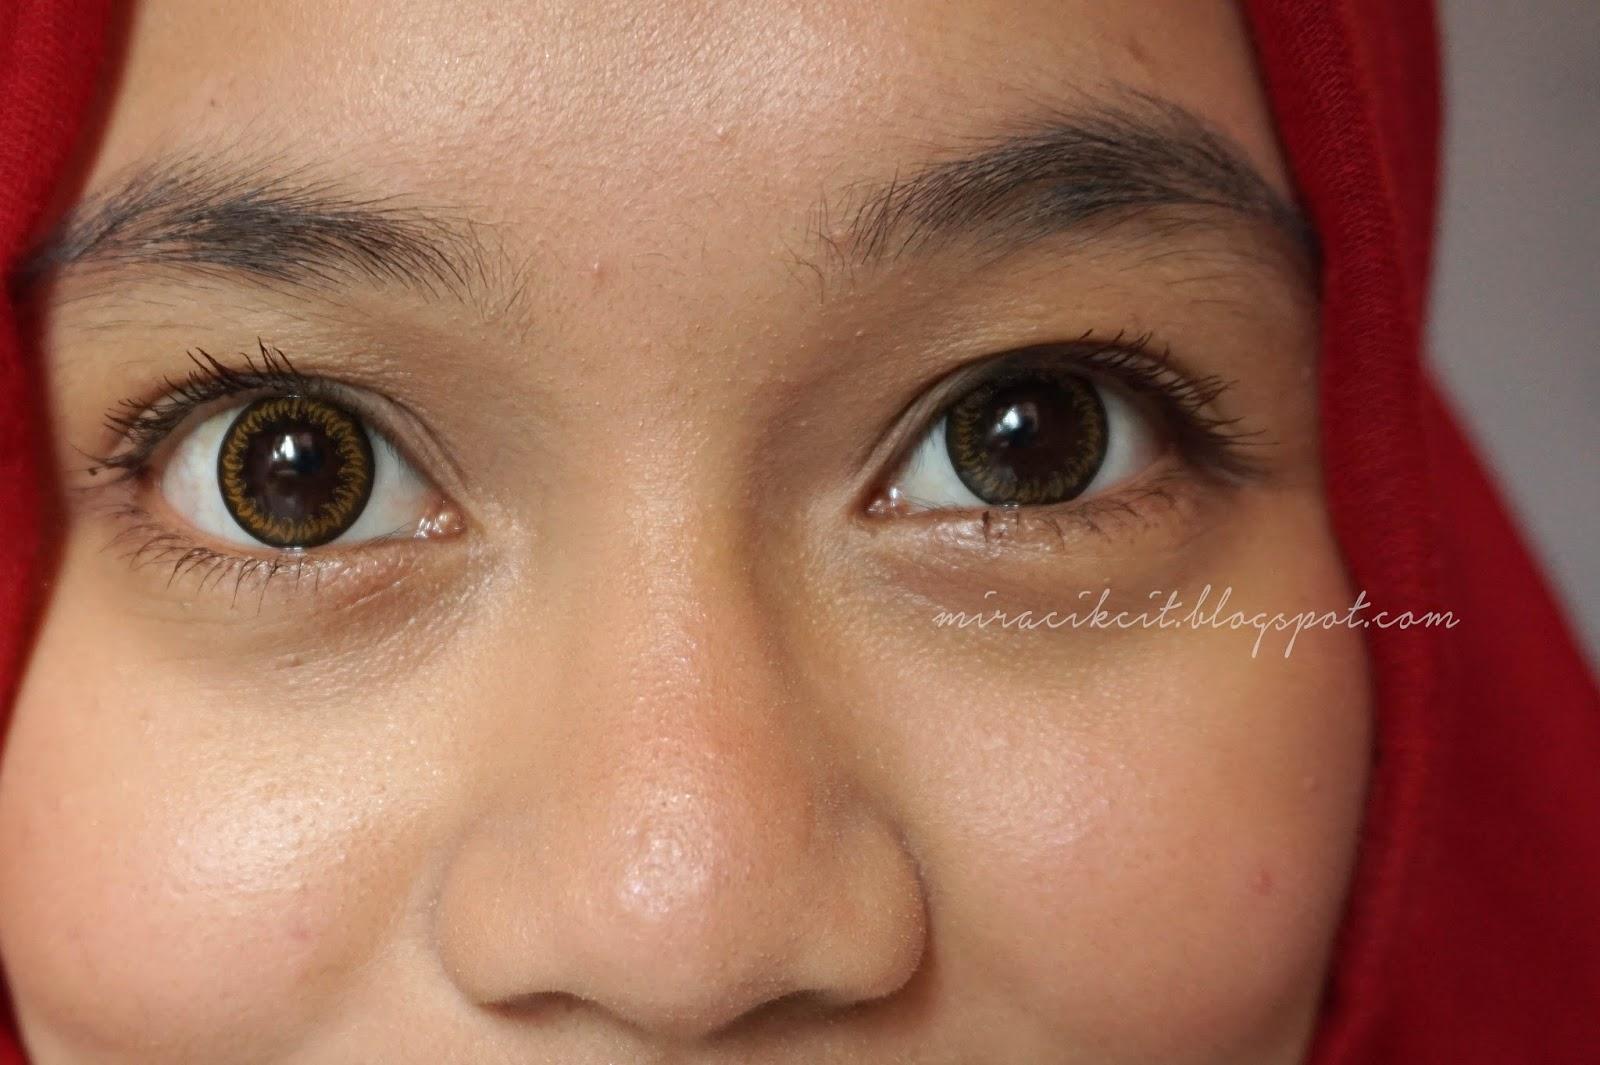 Contact: Review: Horien Eye Secret Contact Lenses In Malaysia